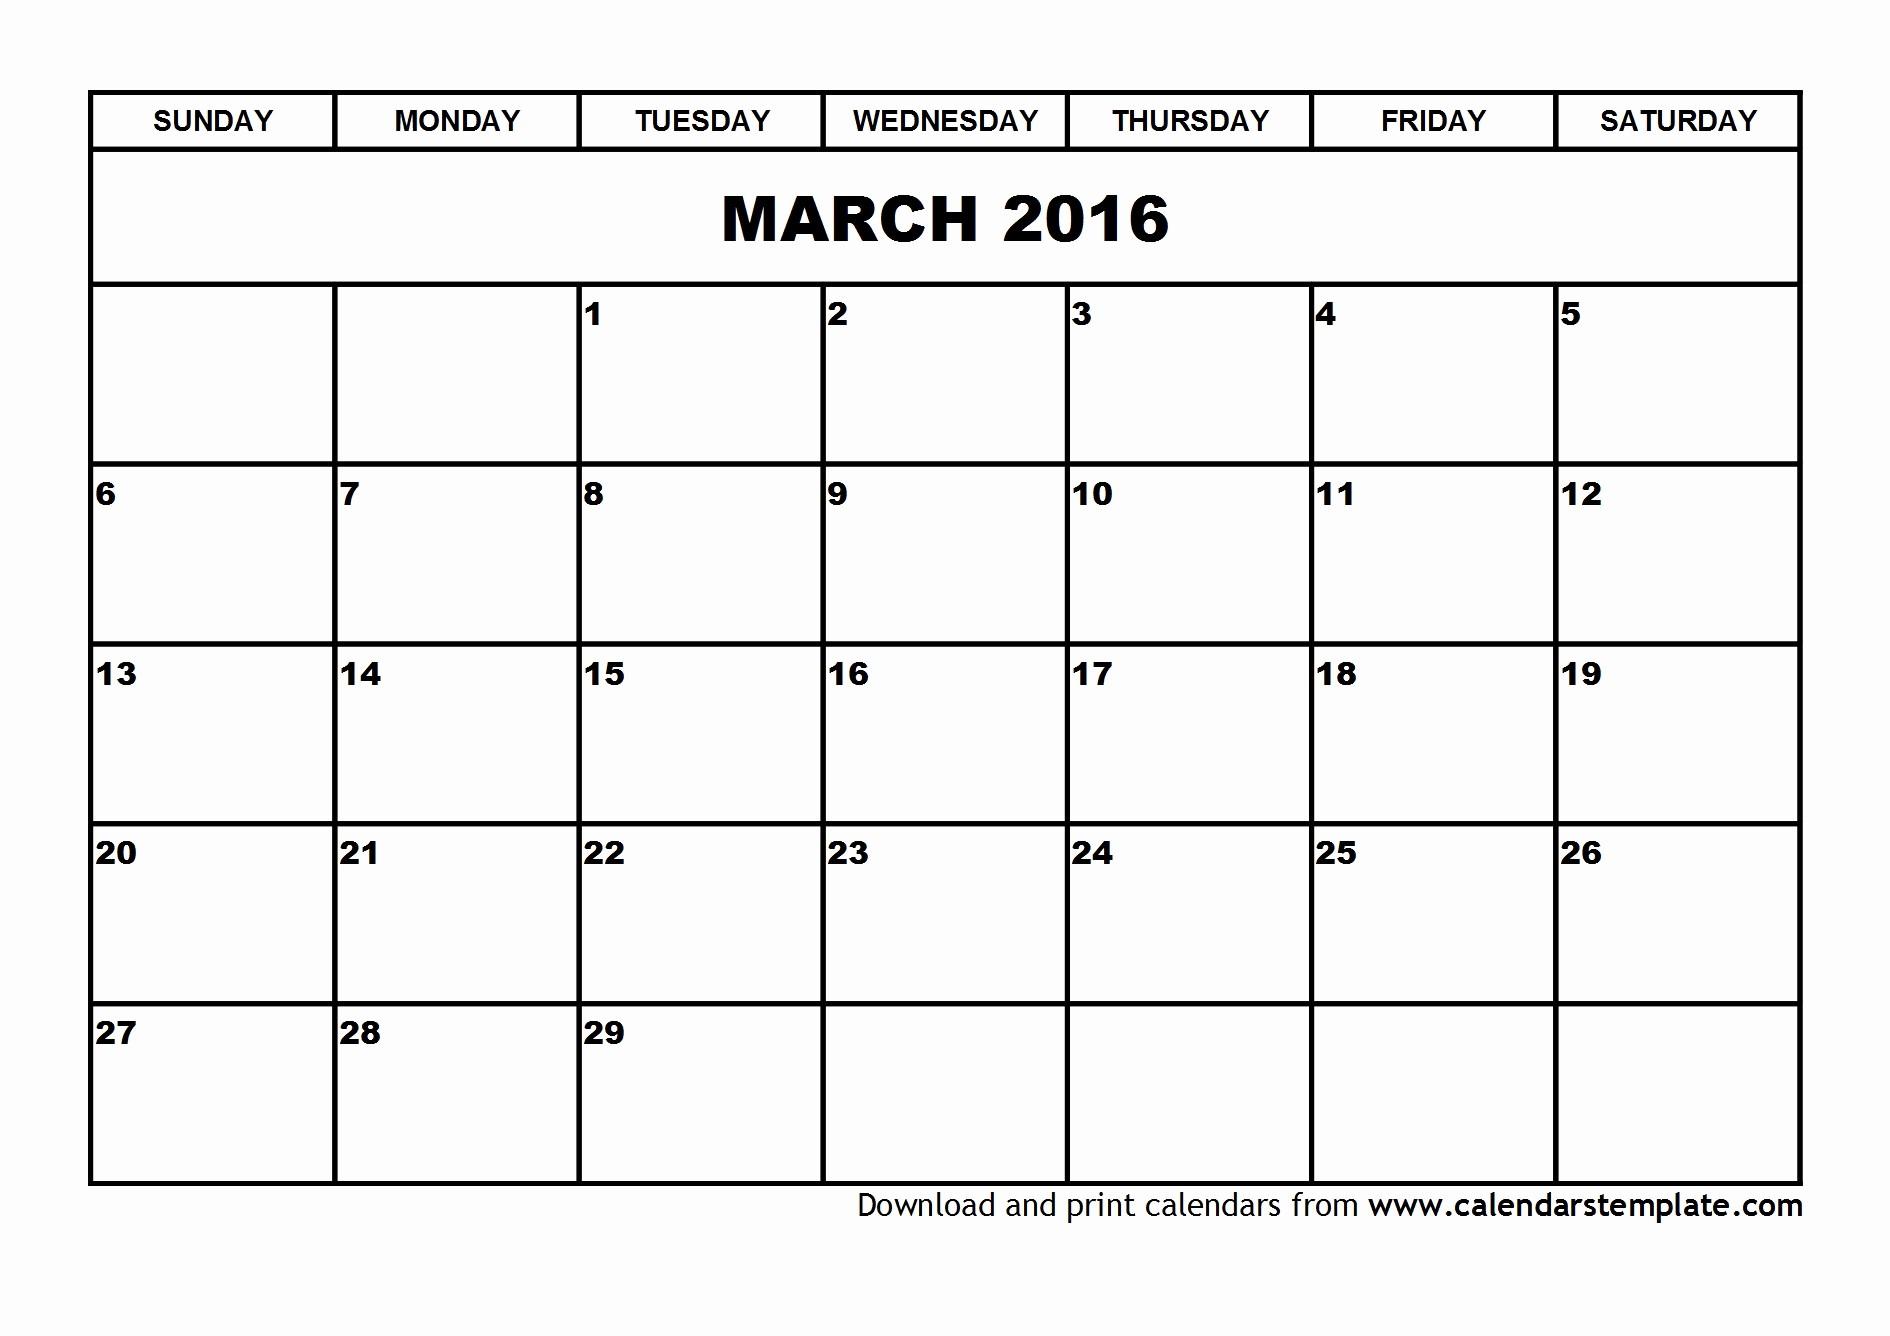 Free Printable Calendars 2016 Templates Elegant March 2016 Calendar Template